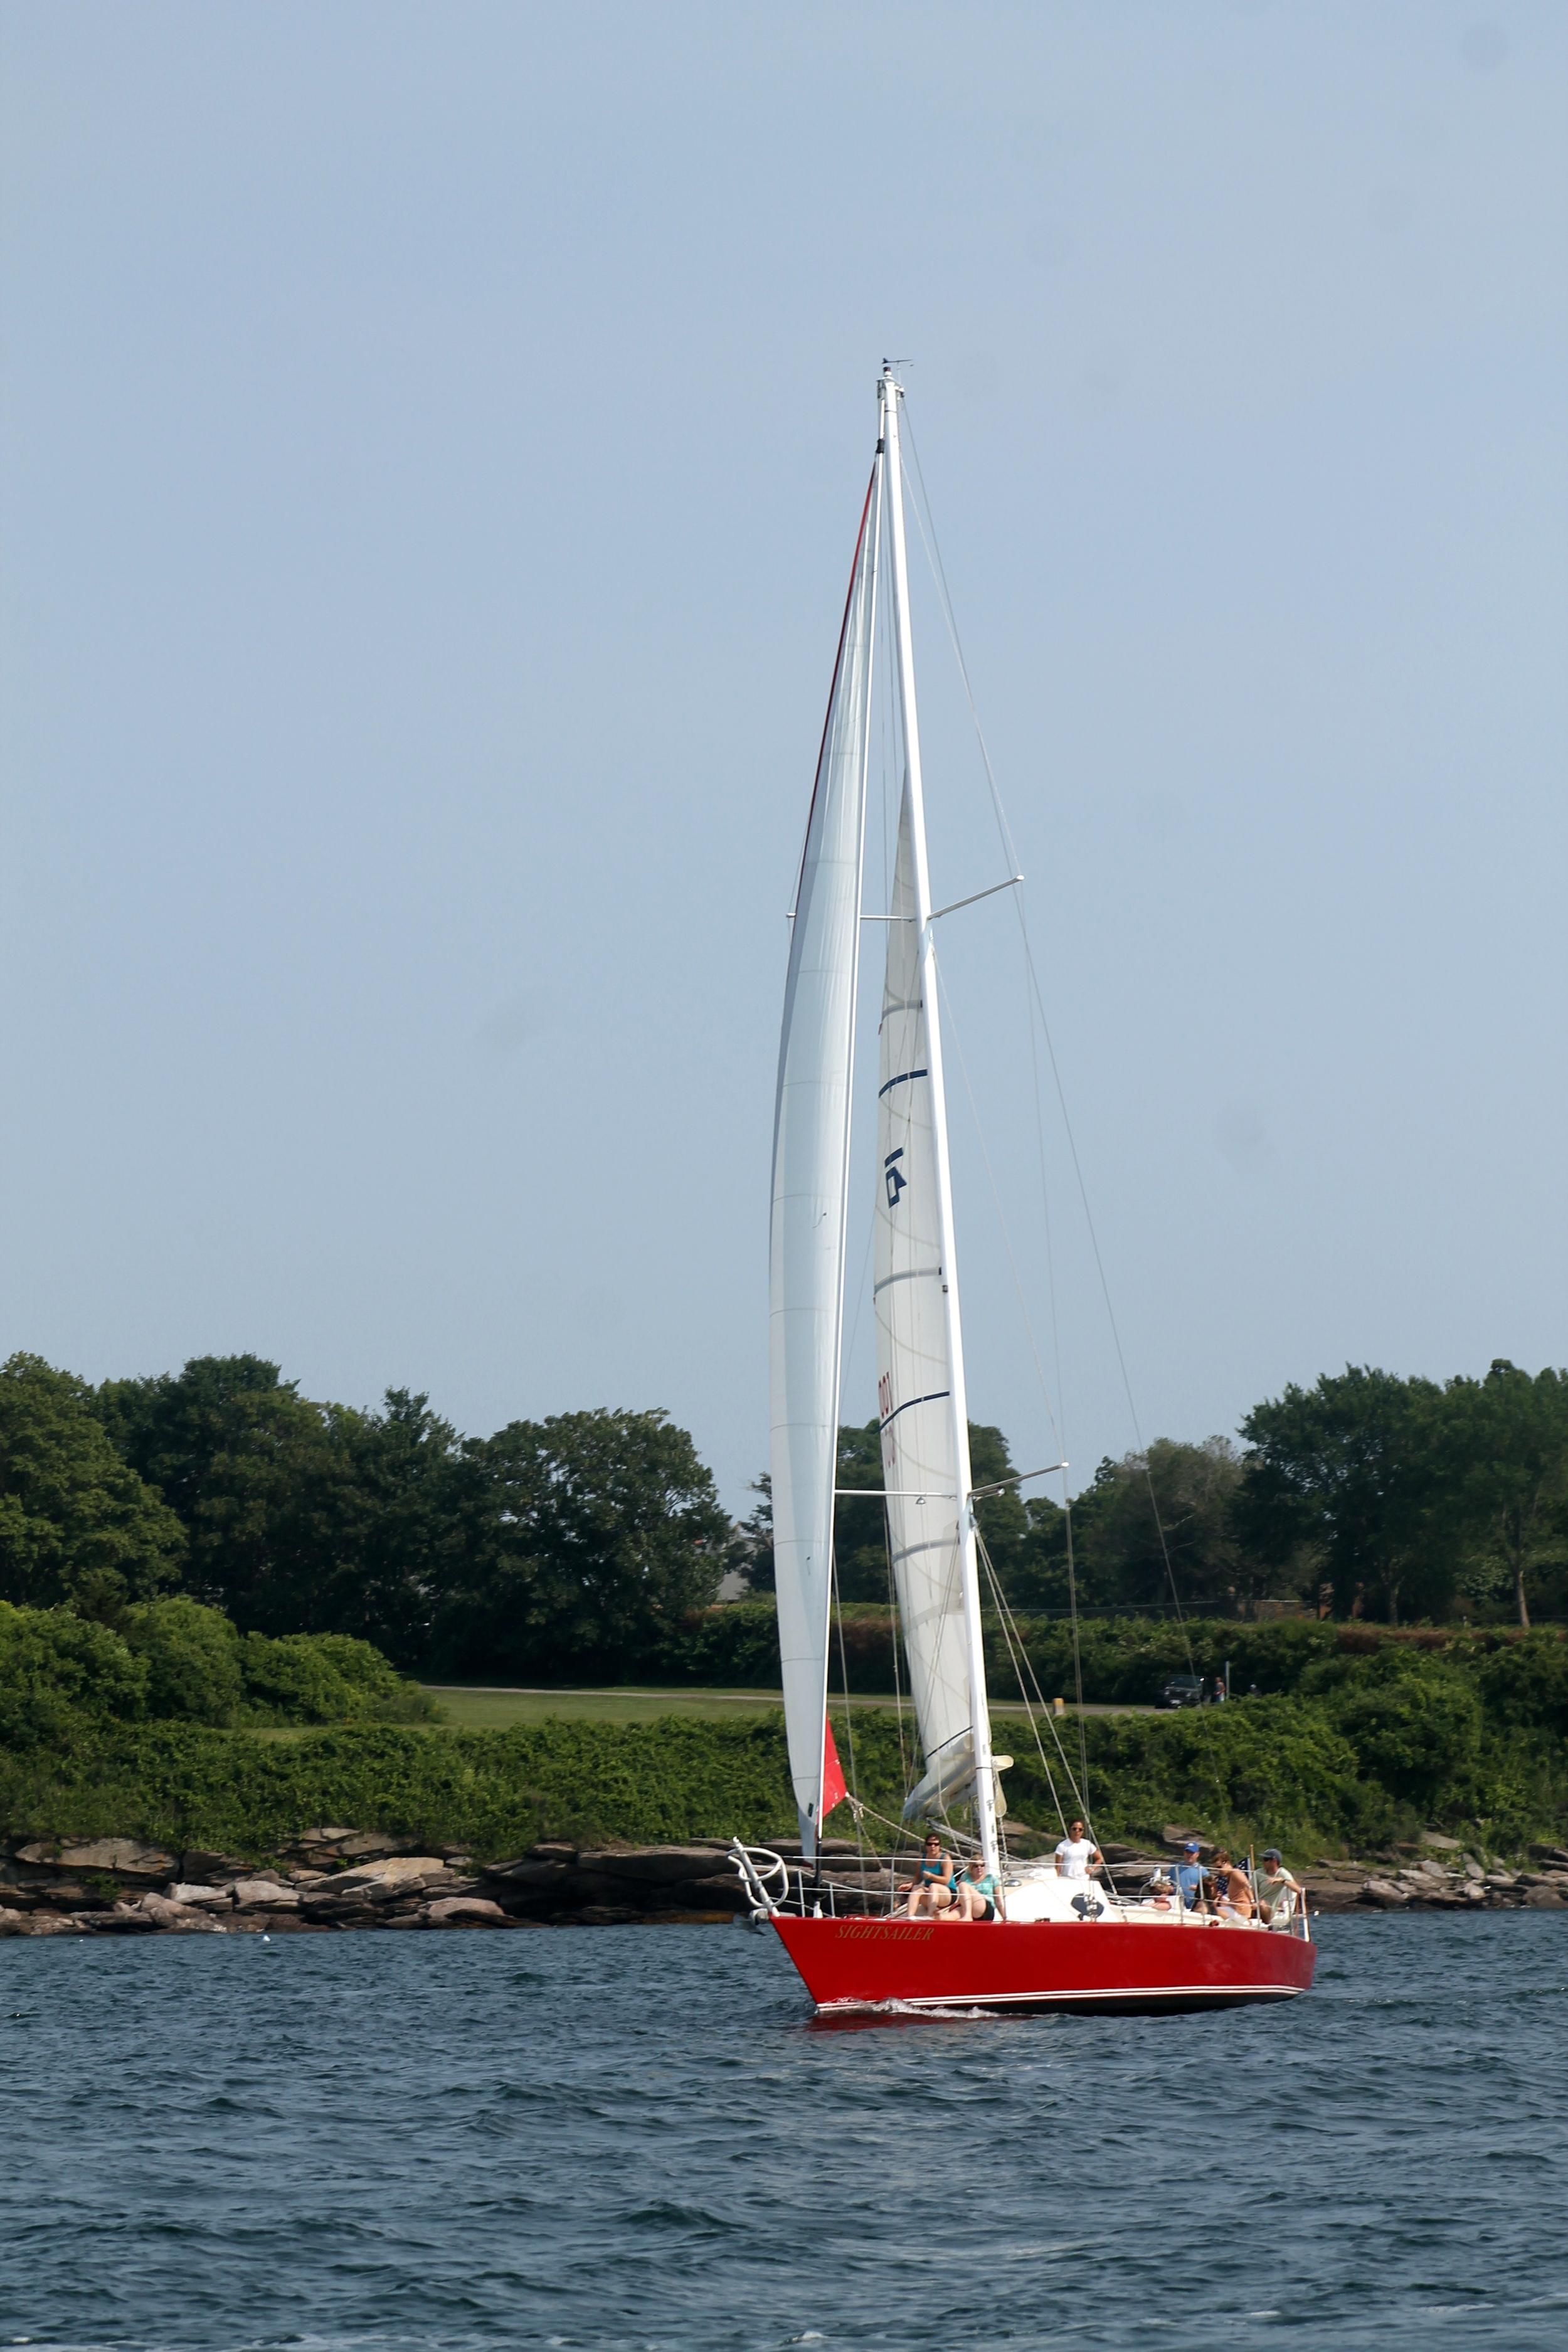 Charter a sailboat in Newport, Rhode Island. Image via Jessica Gordon Ryan